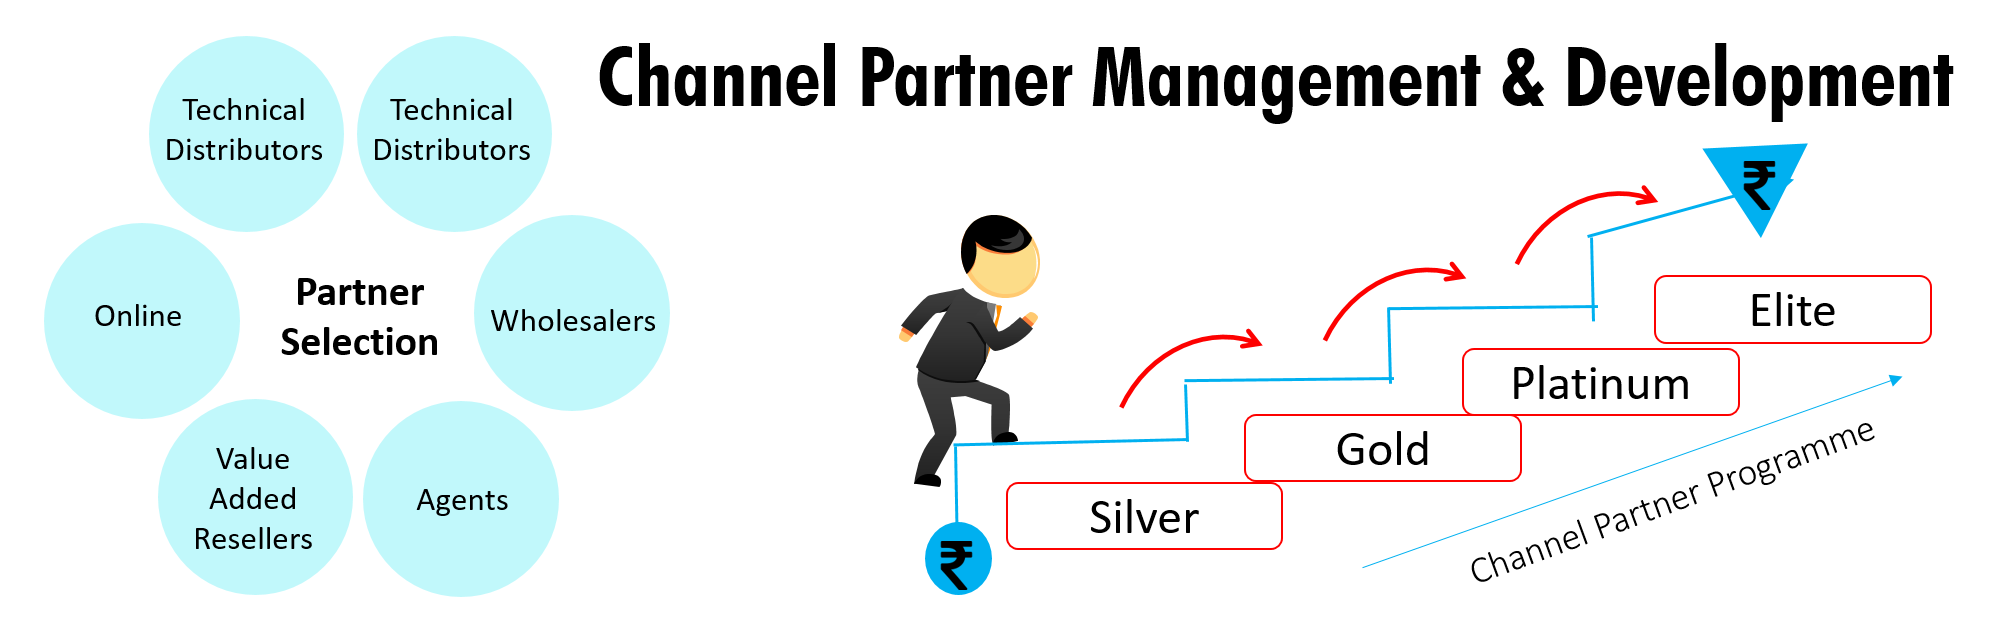 Channel Partner Management & Development